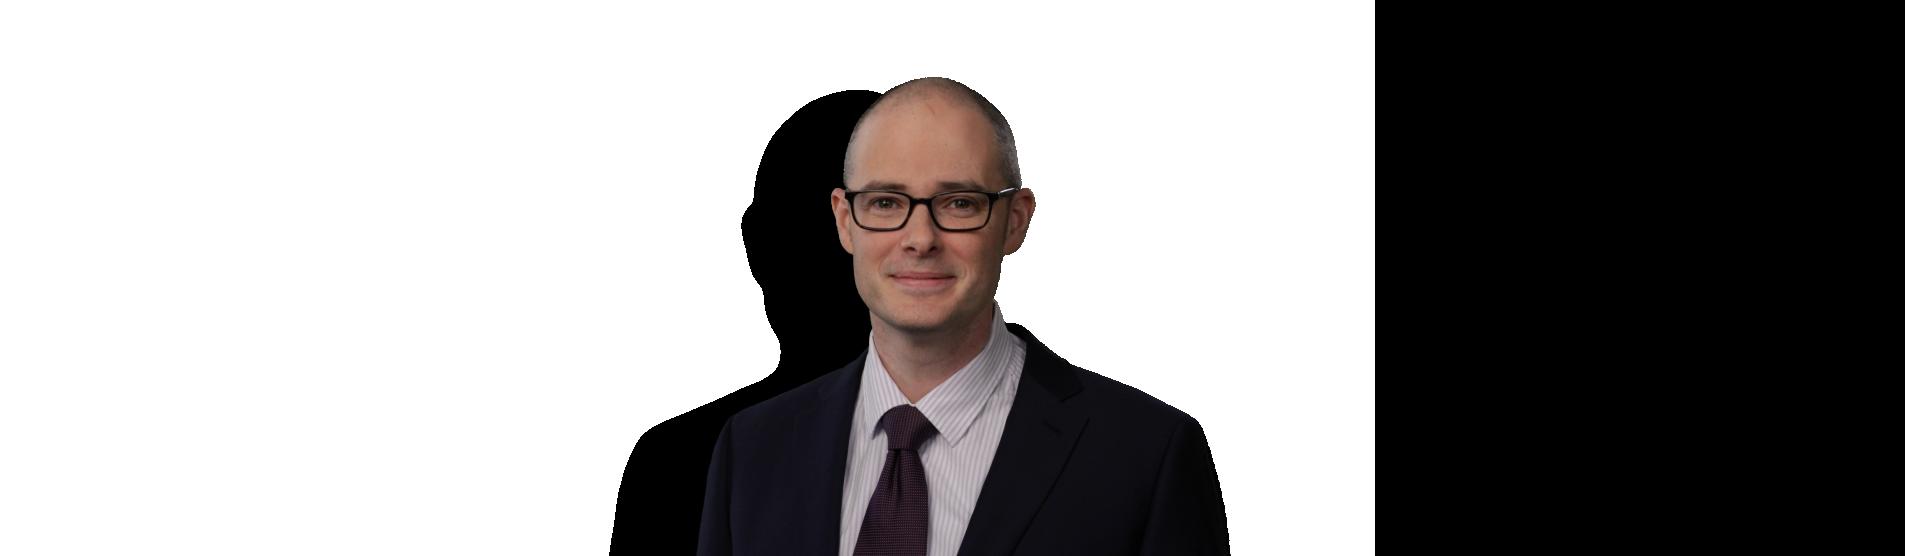 Headshot of Michael T. Ghobrial